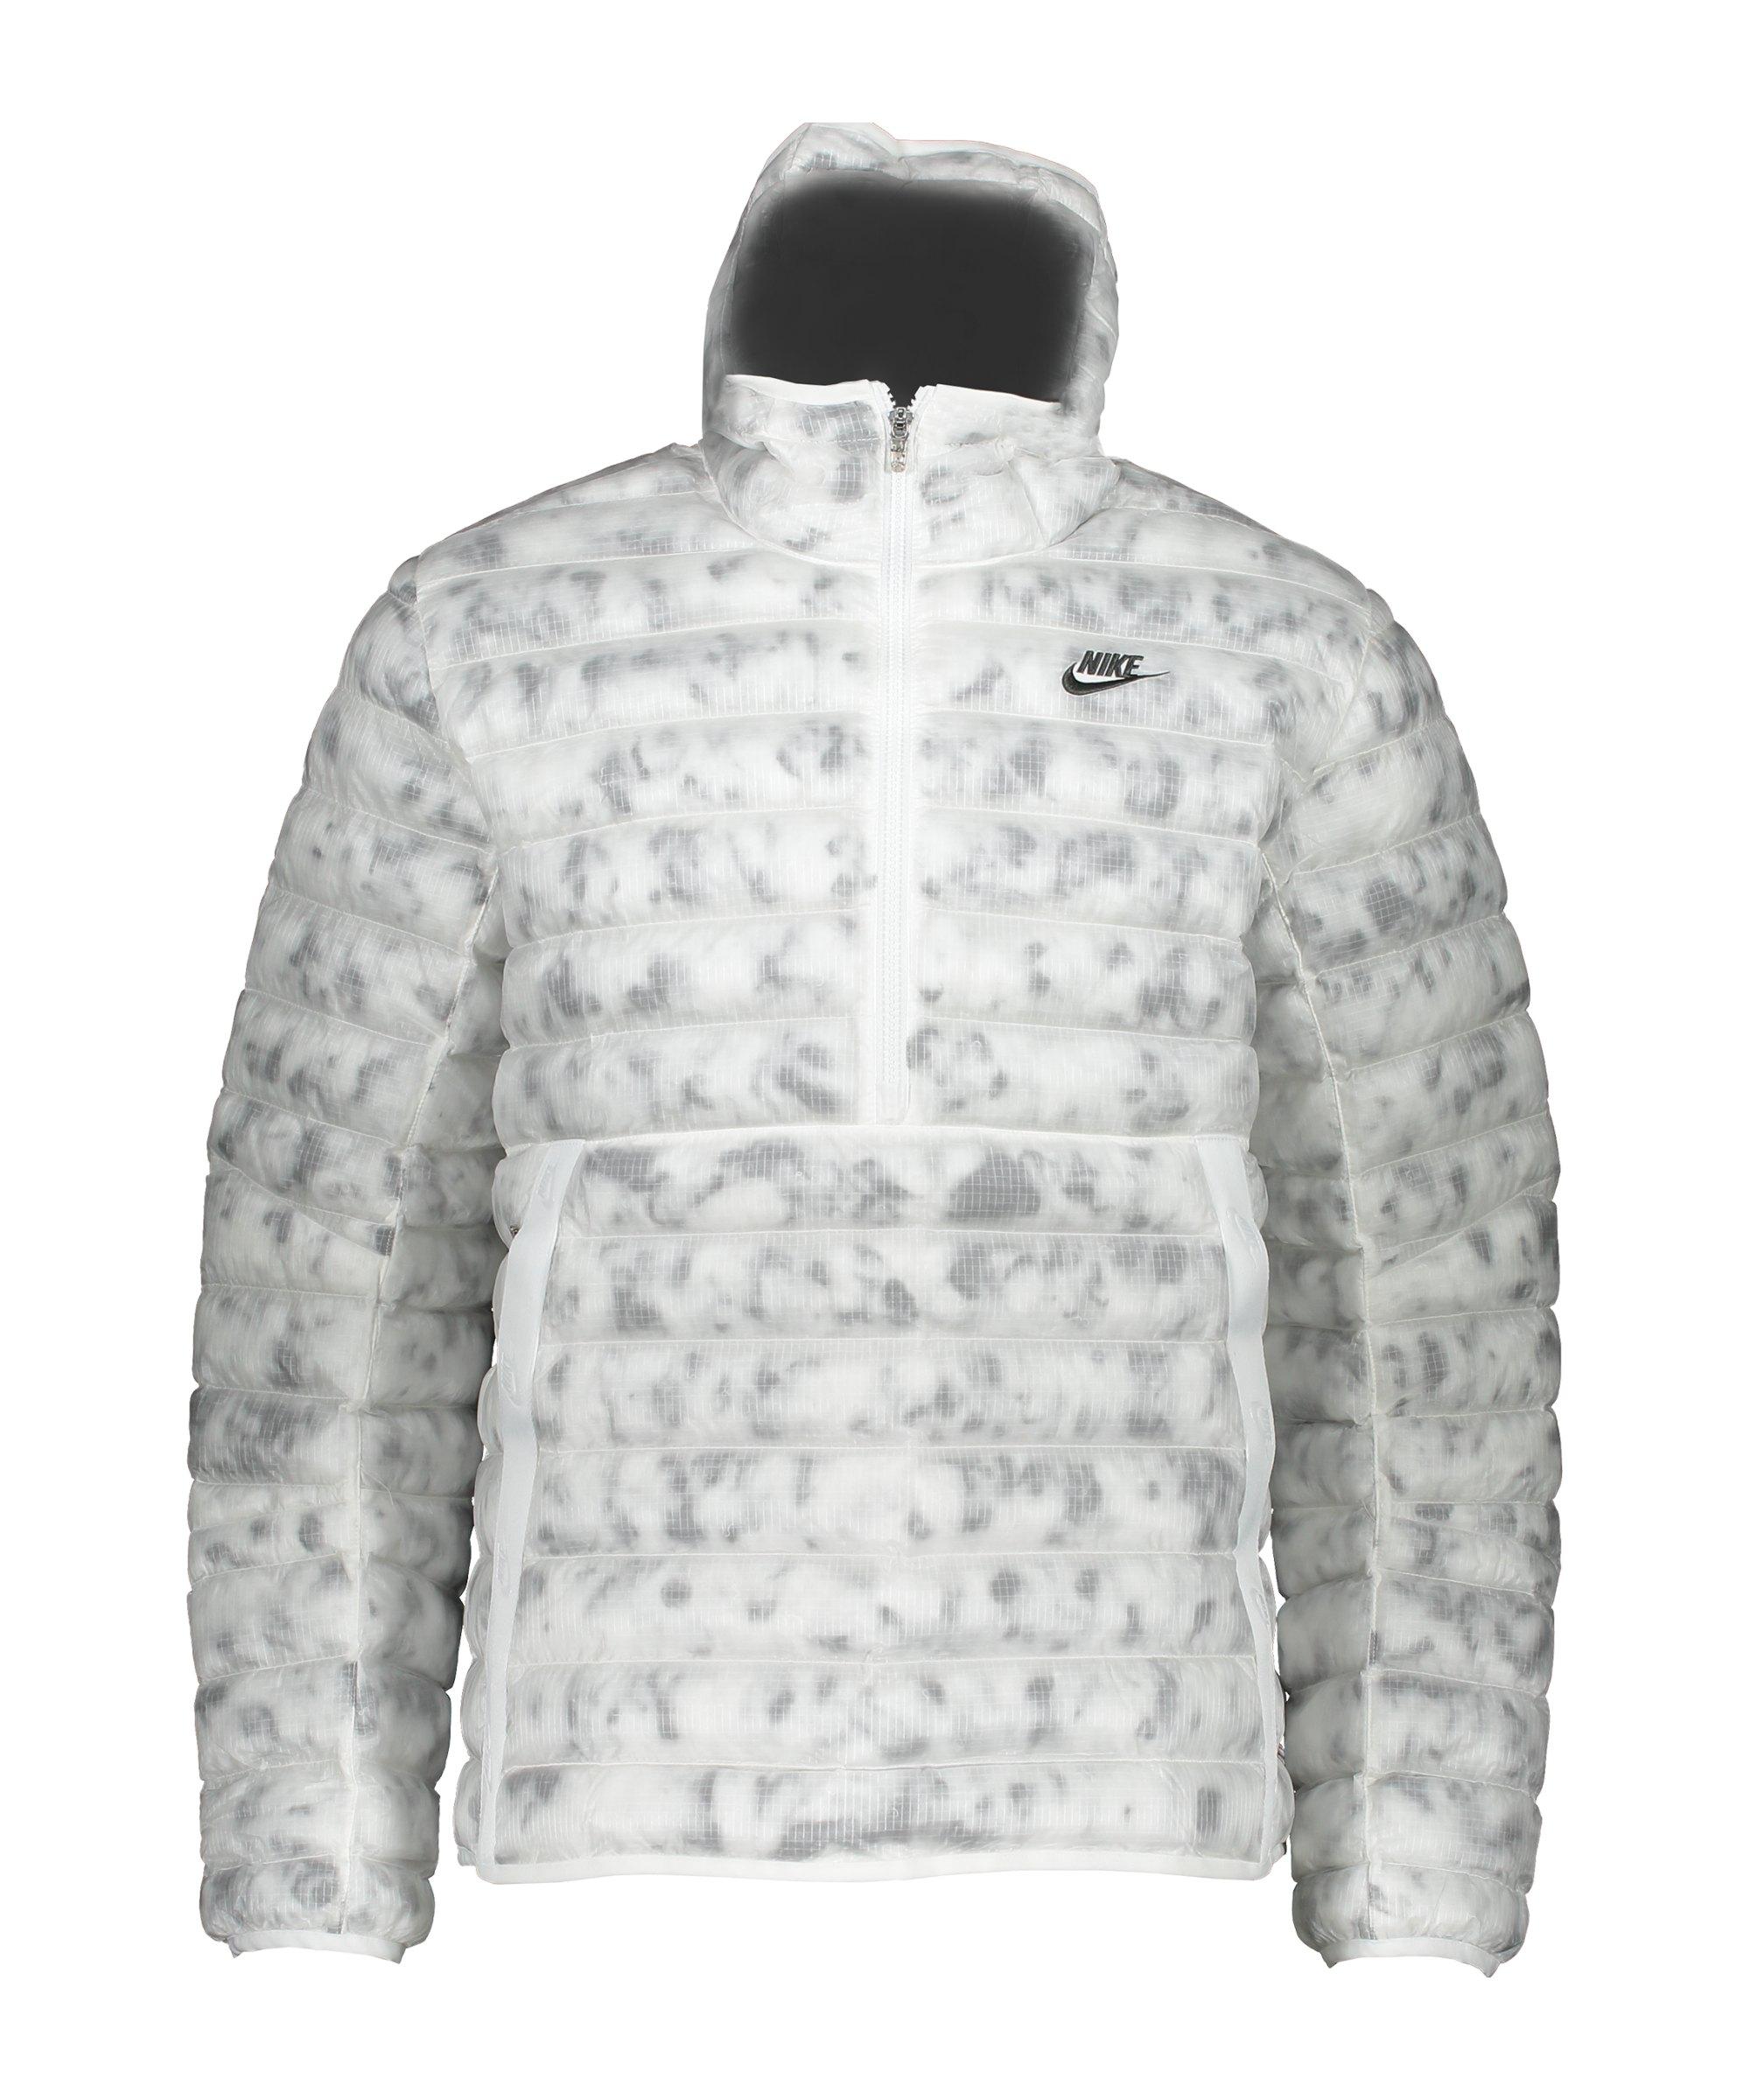 Nike Marble Insulation Jacke Weiss Grau F121 - weiss